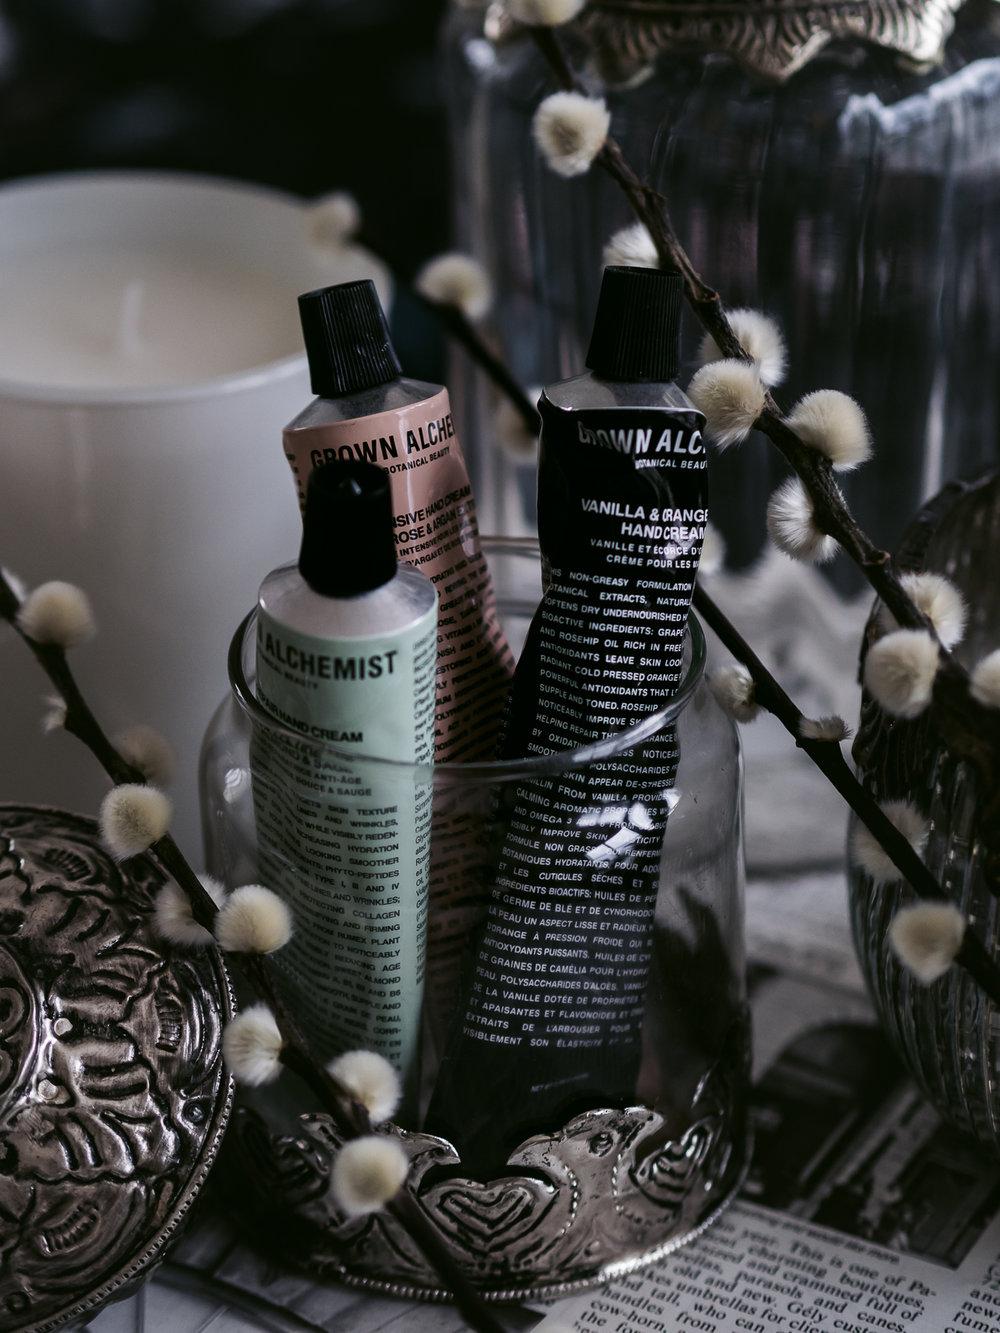 Grown Alchemist Hand Cream - 10-10 Hope - Yes! Please Enjoy-5.jpg